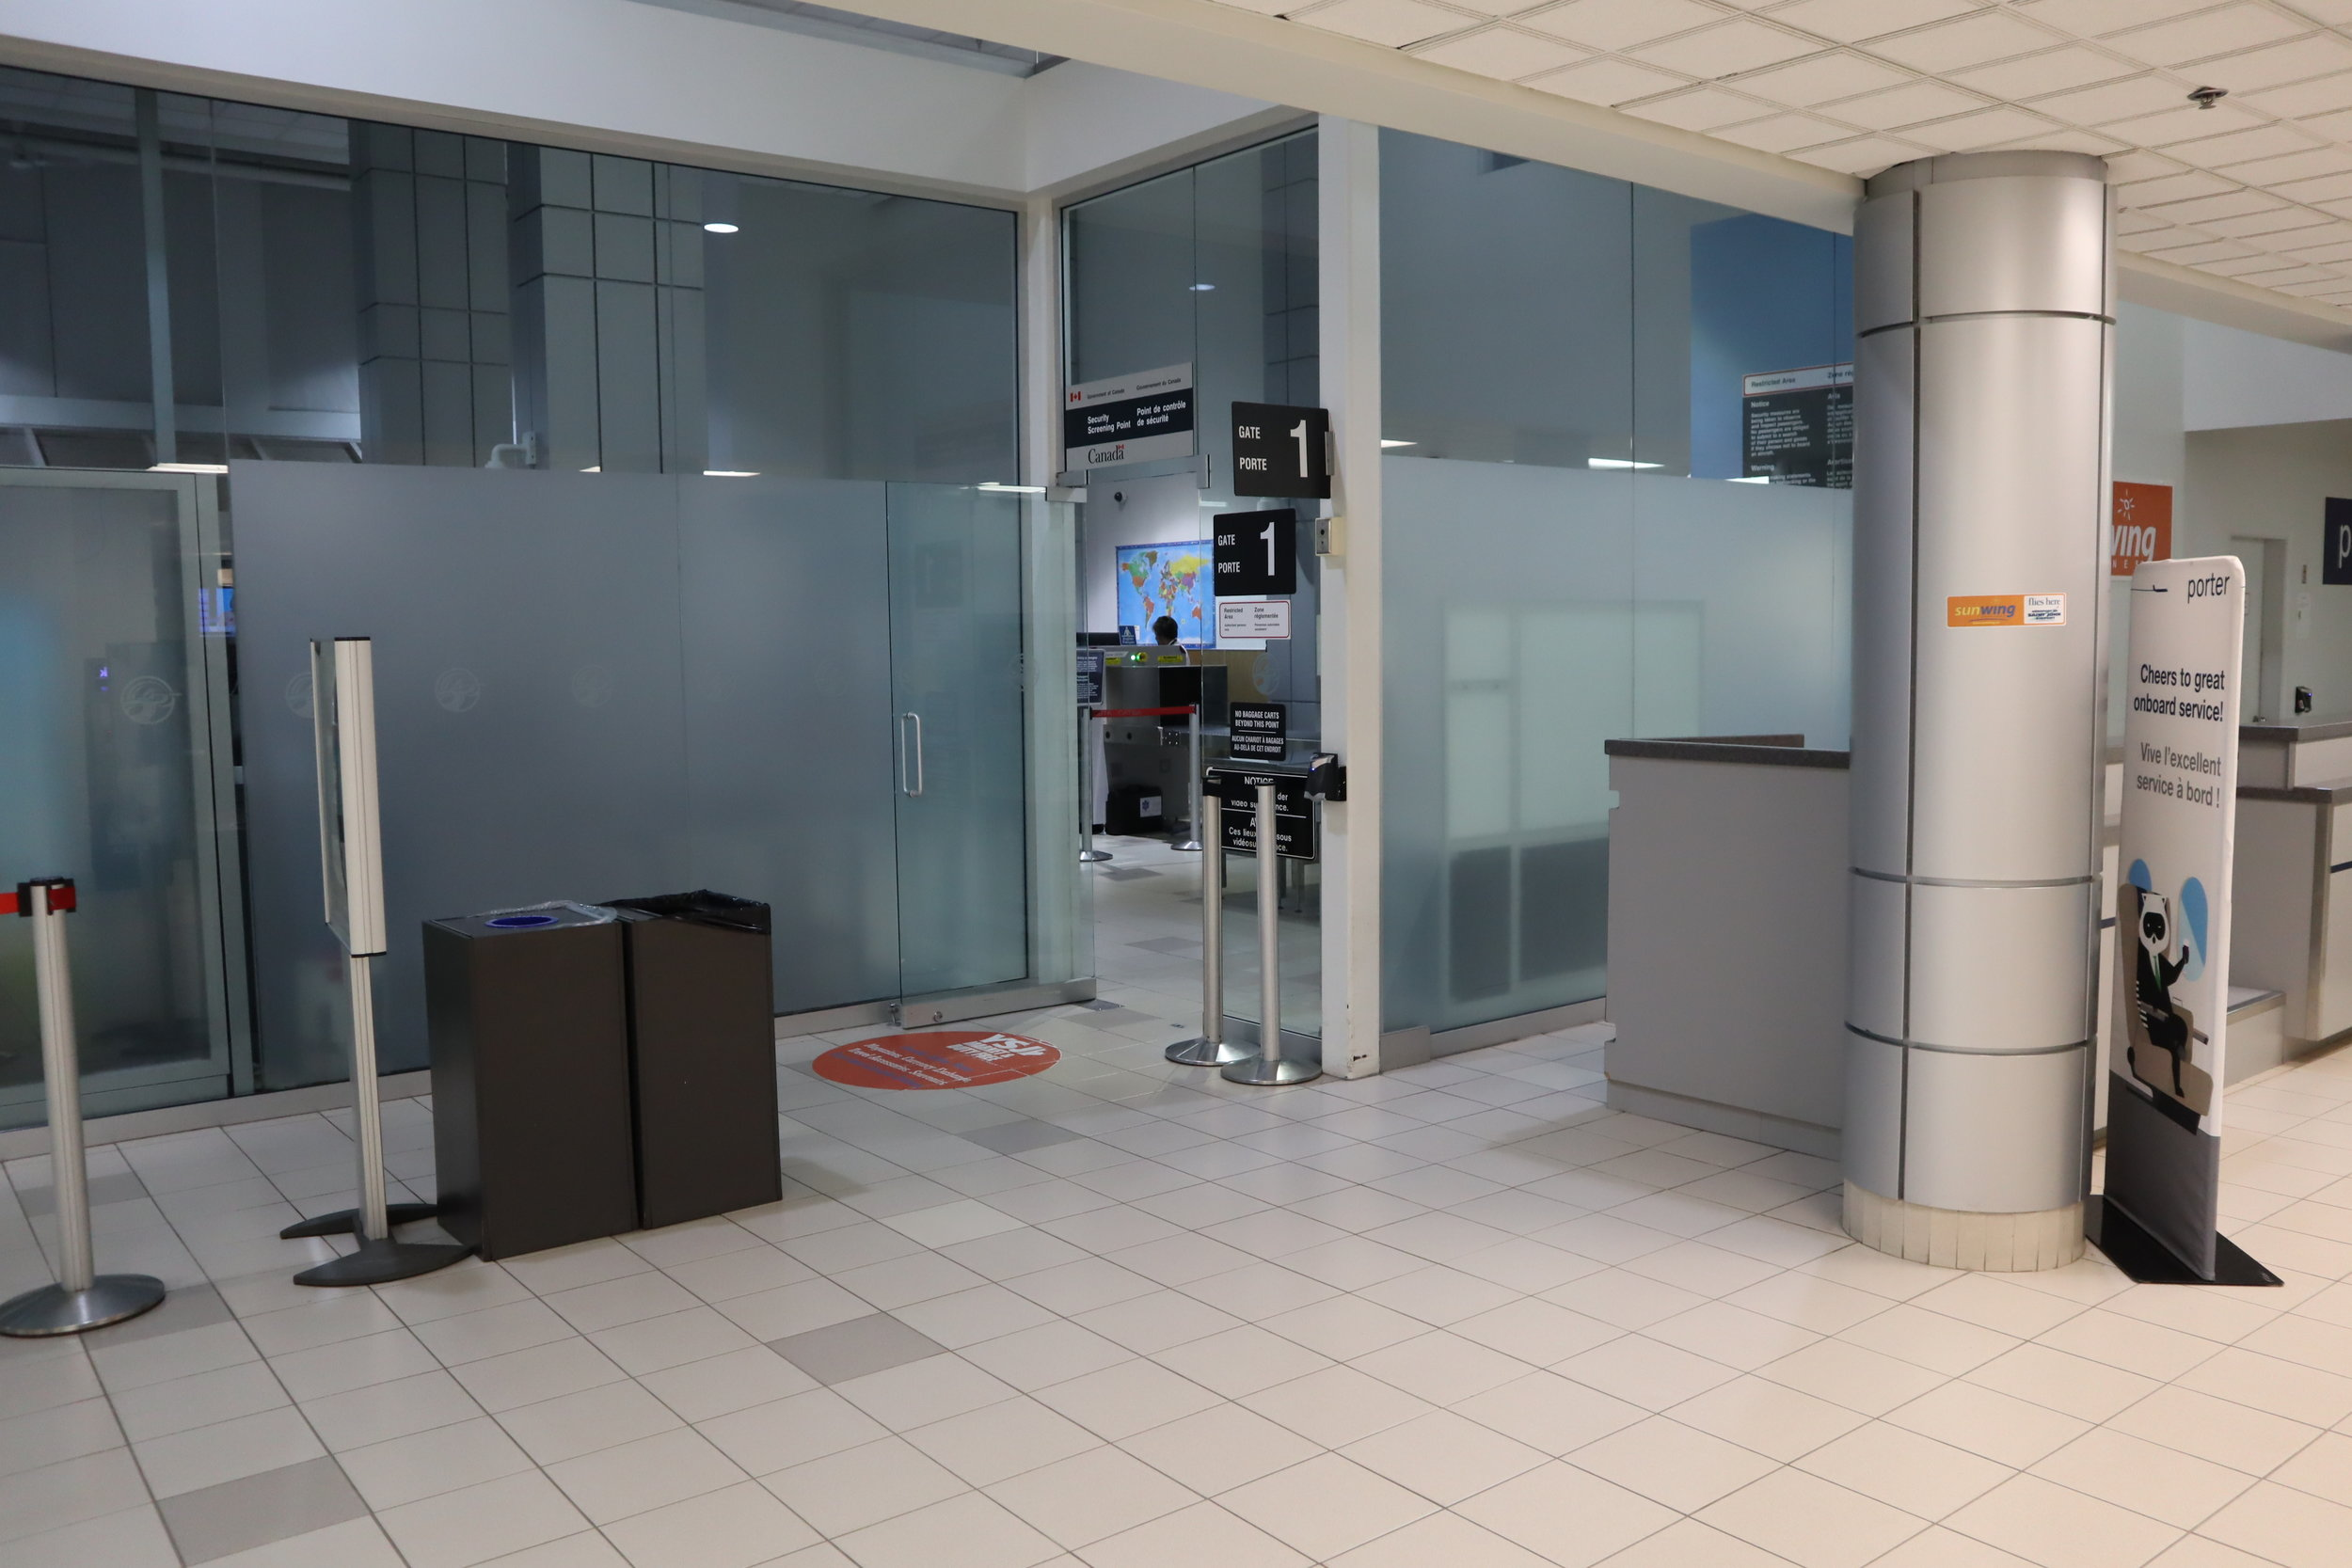 Saint John Airport – Security checkpoint